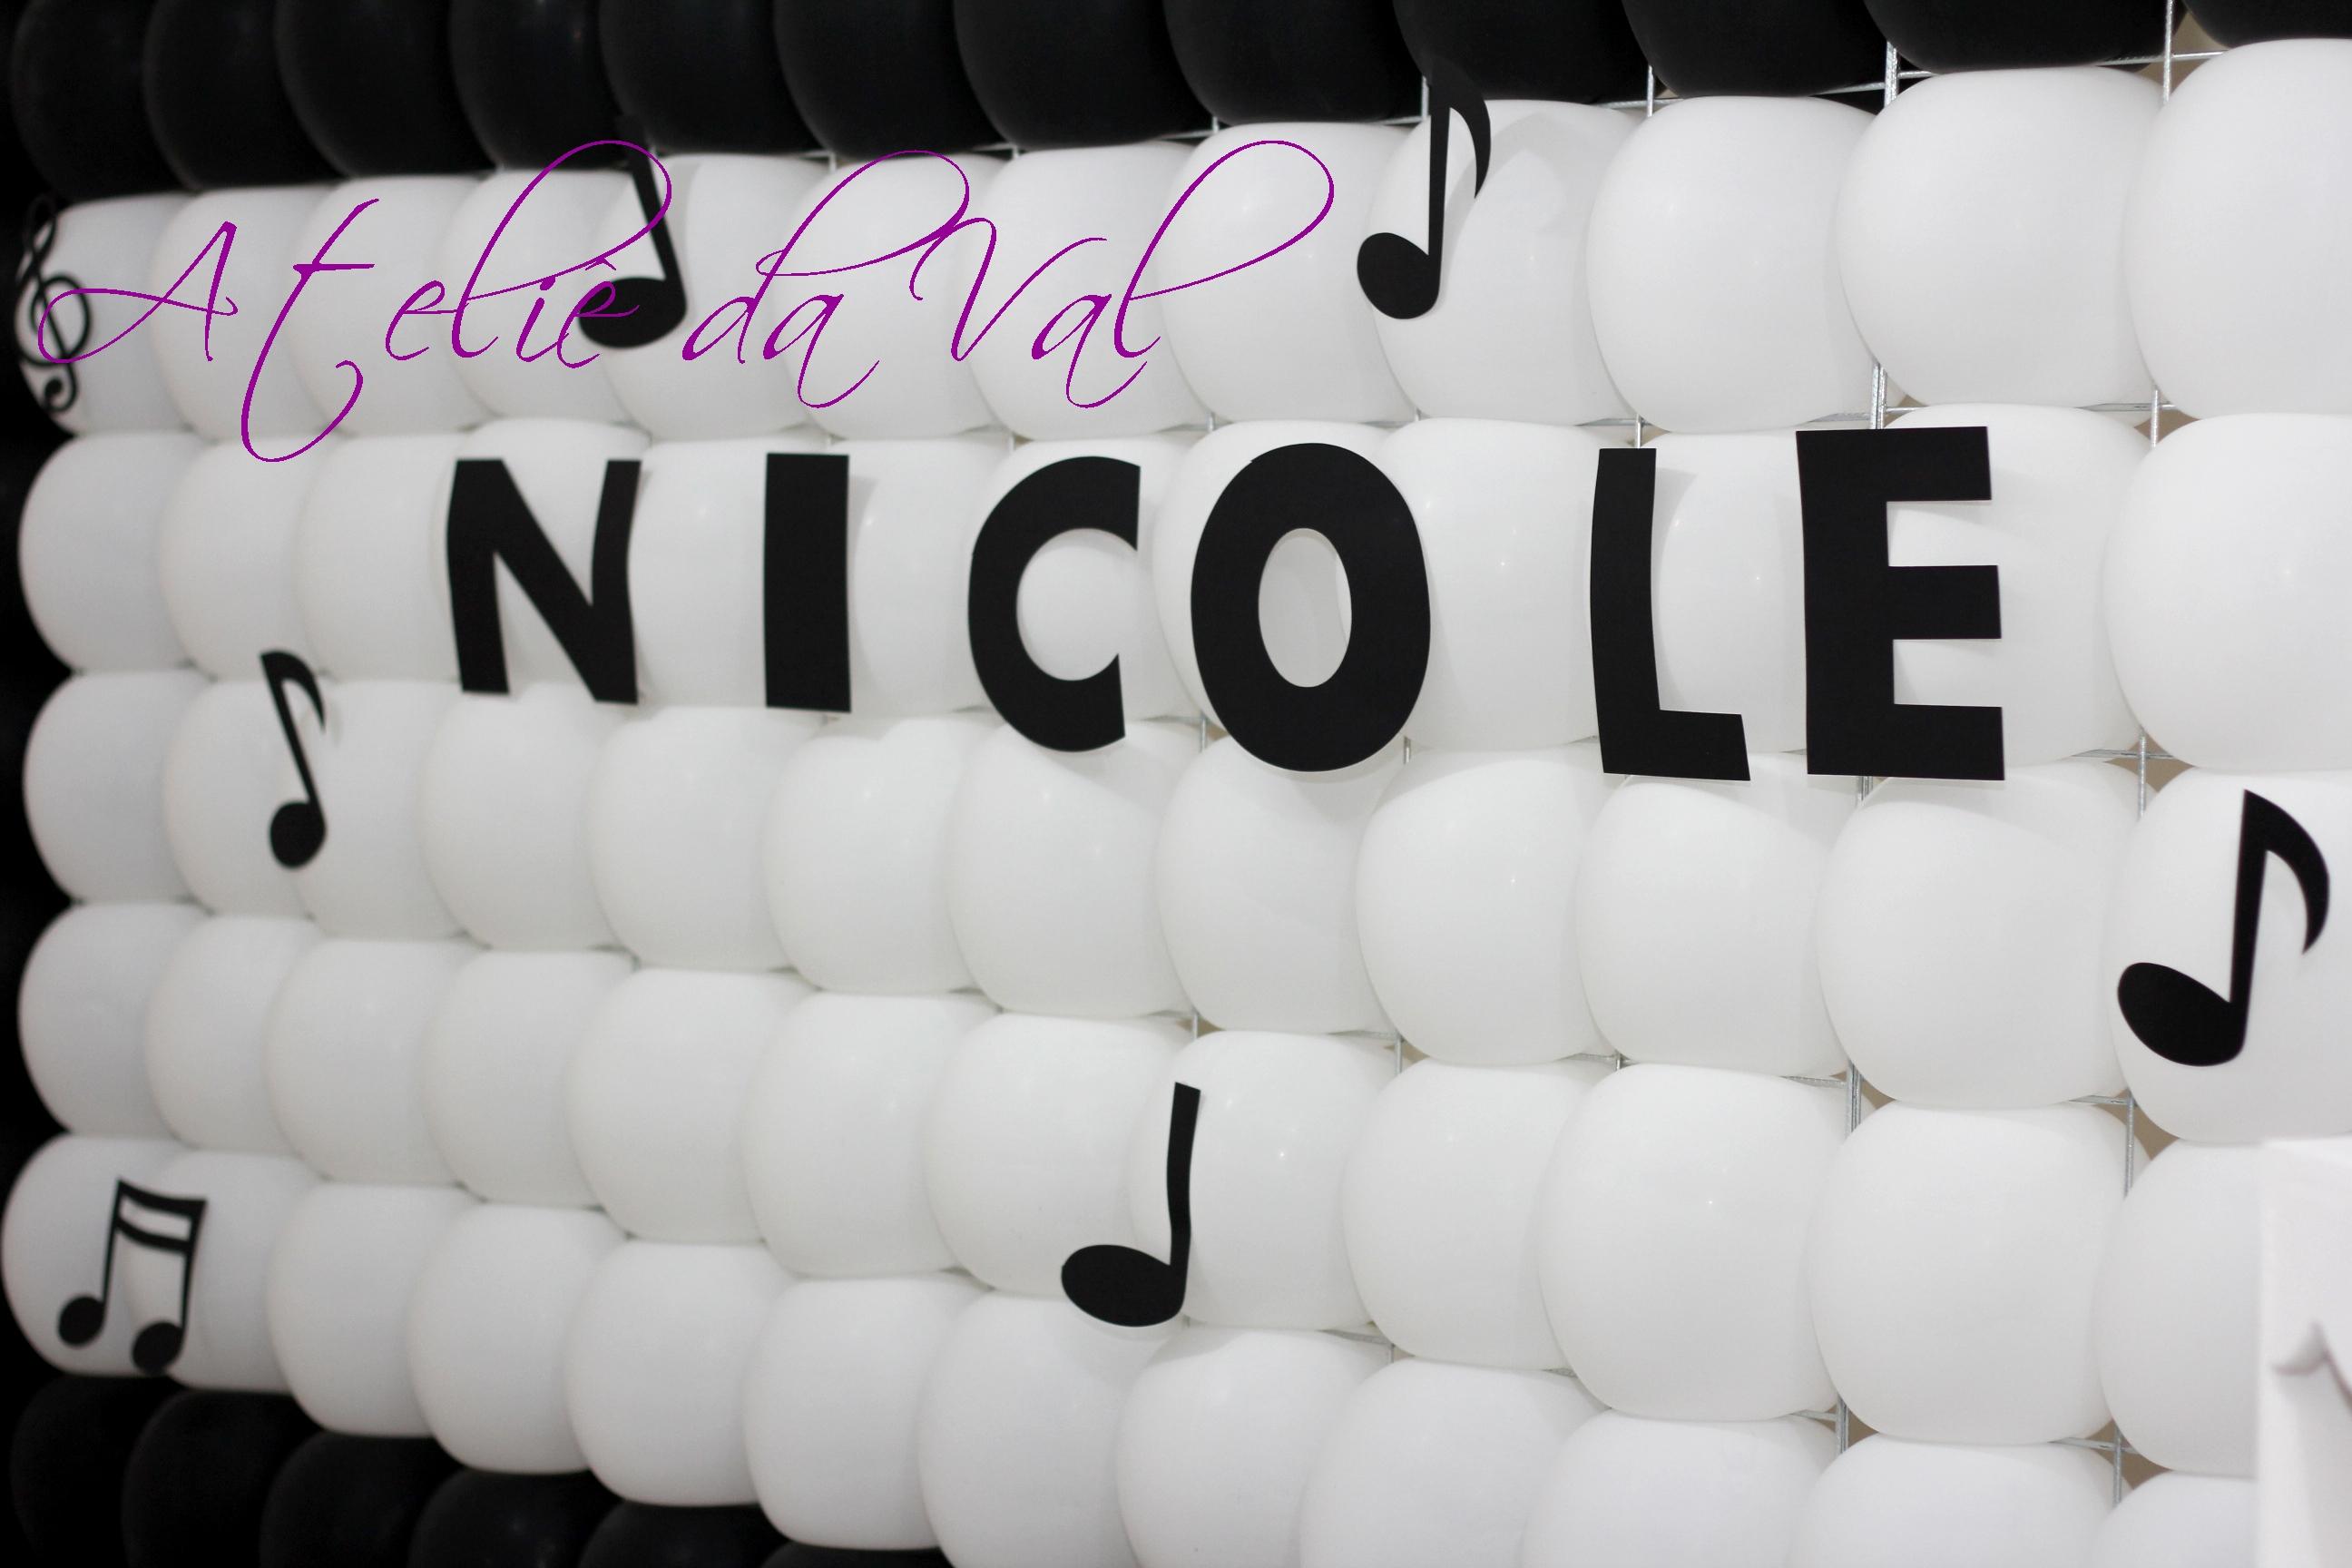 decoracao festa notas musicais: notas musicais provencal decoracao provencal notas musicais festa